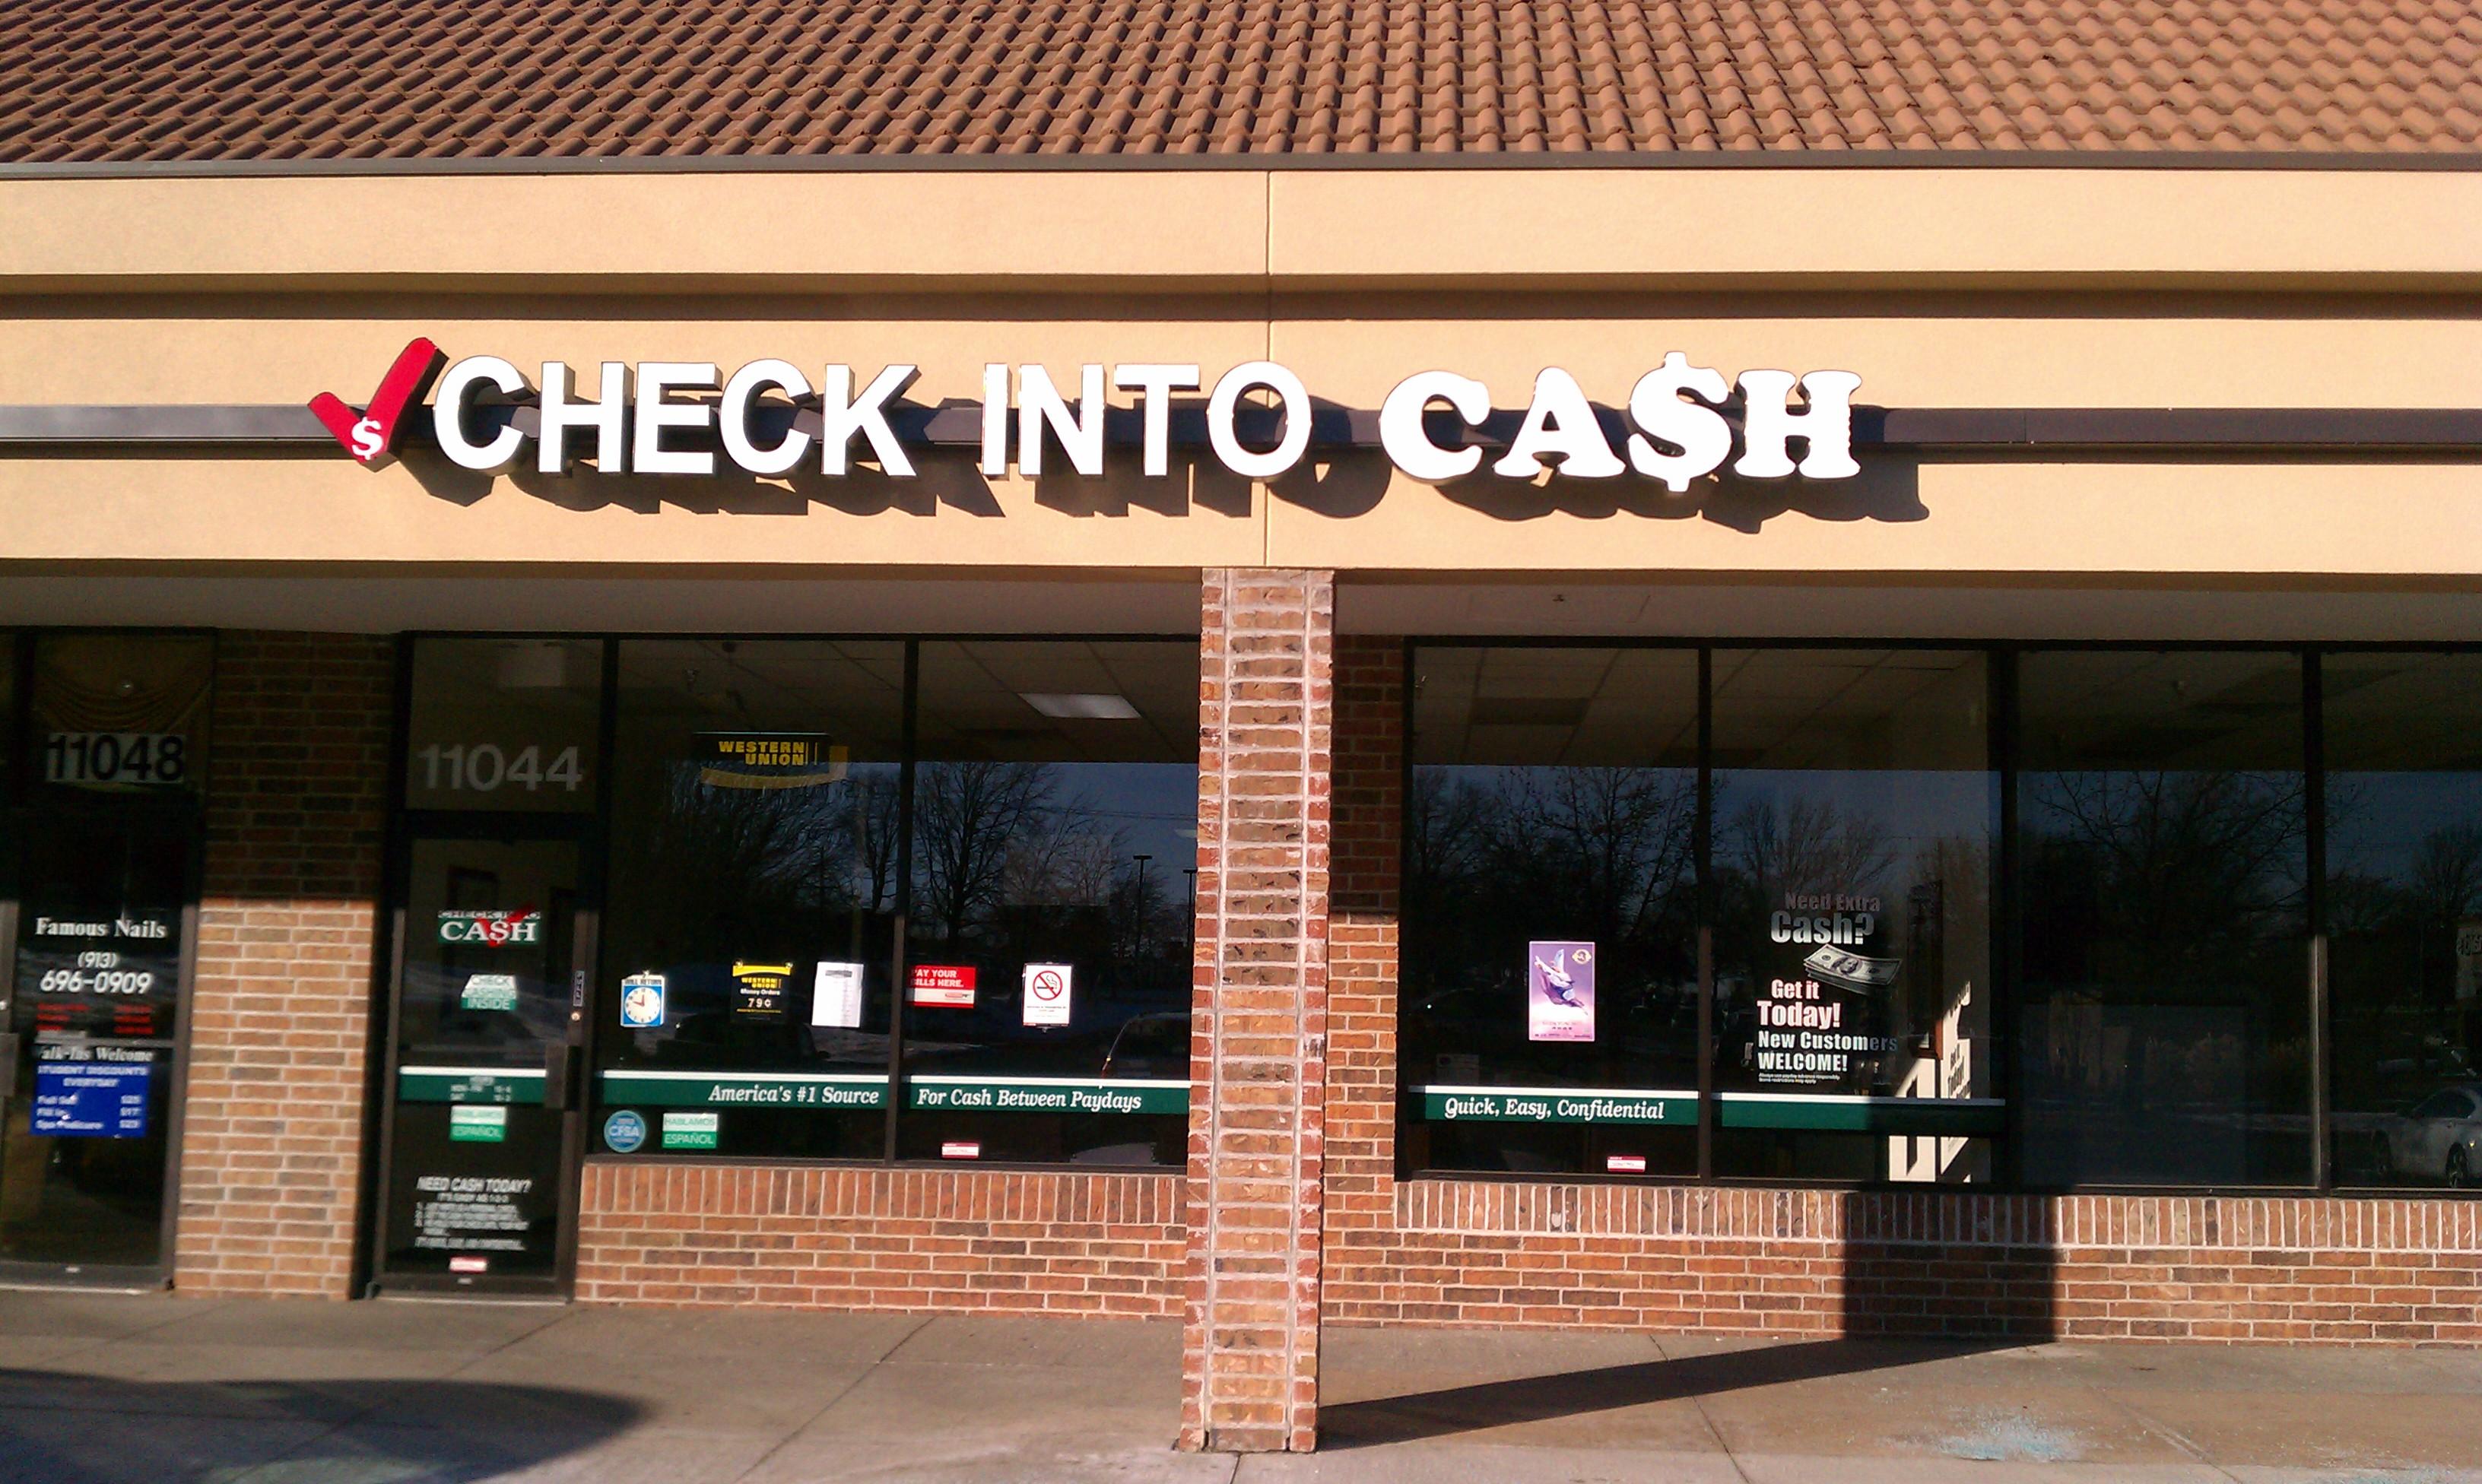 Cash advance sun valley photo 9